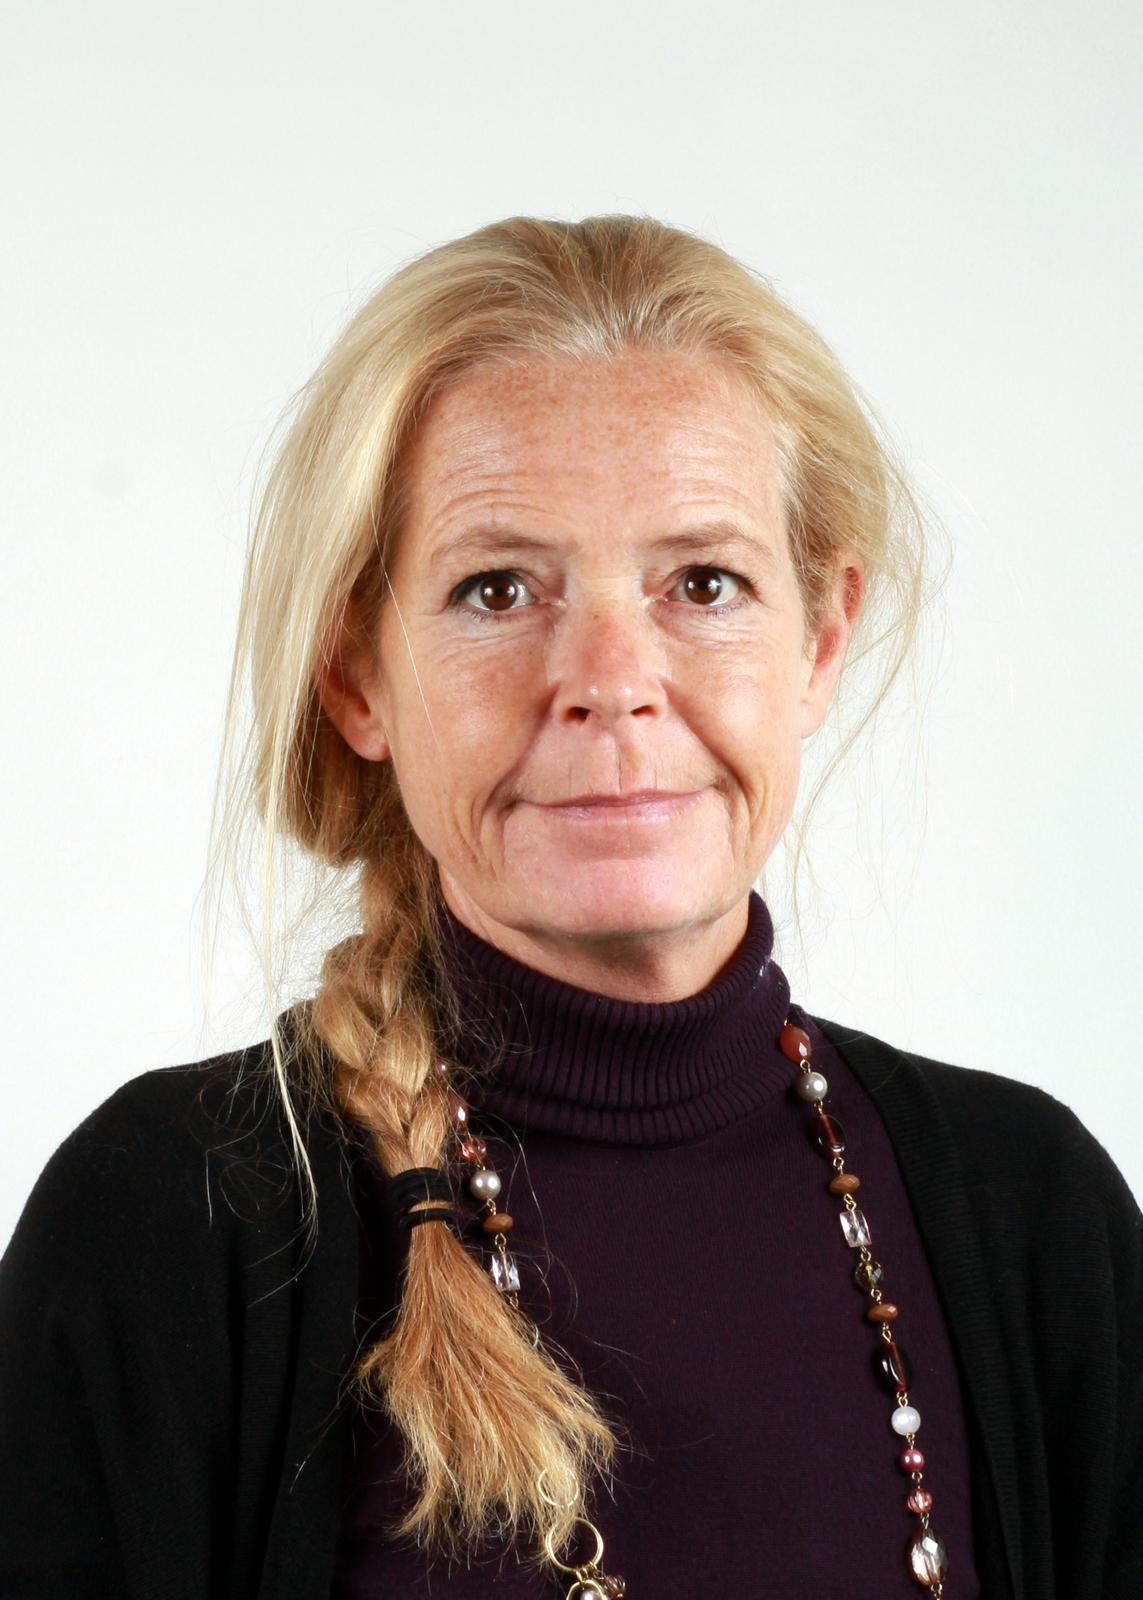 Katarina Ennerfelt